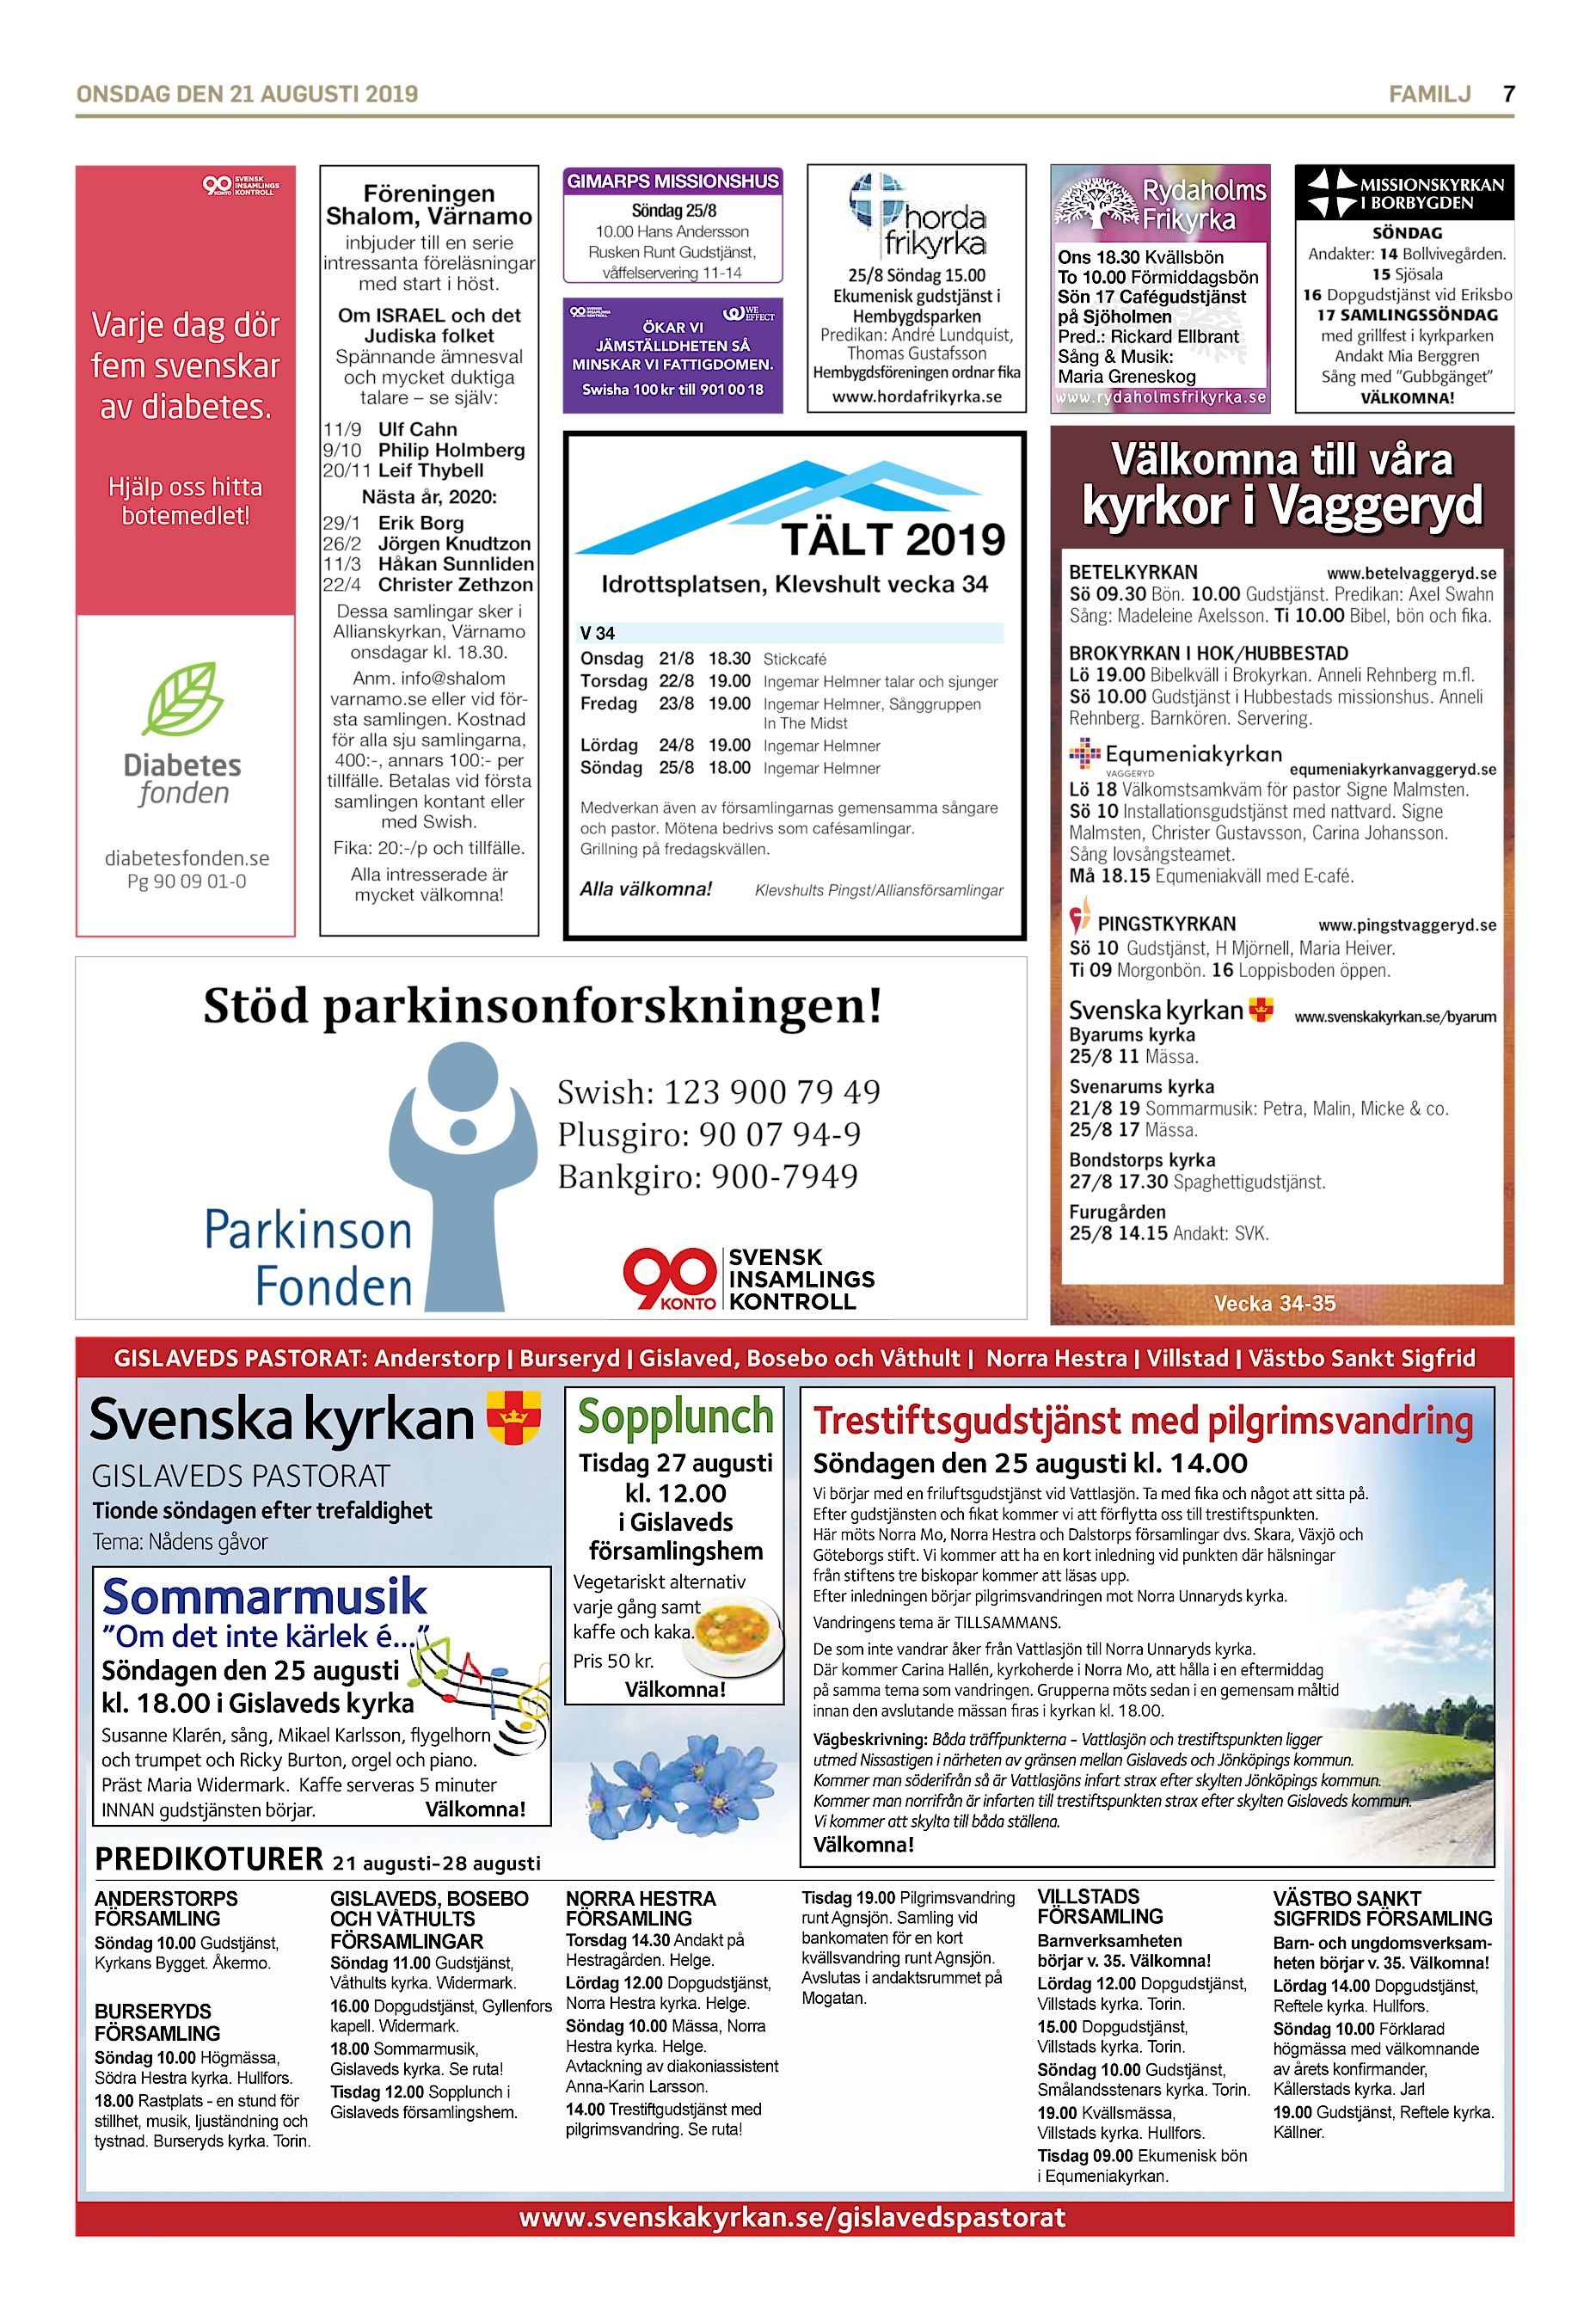 Simrishamnsvgen 28F Skne ln, Tomelilla - patient-survey.net